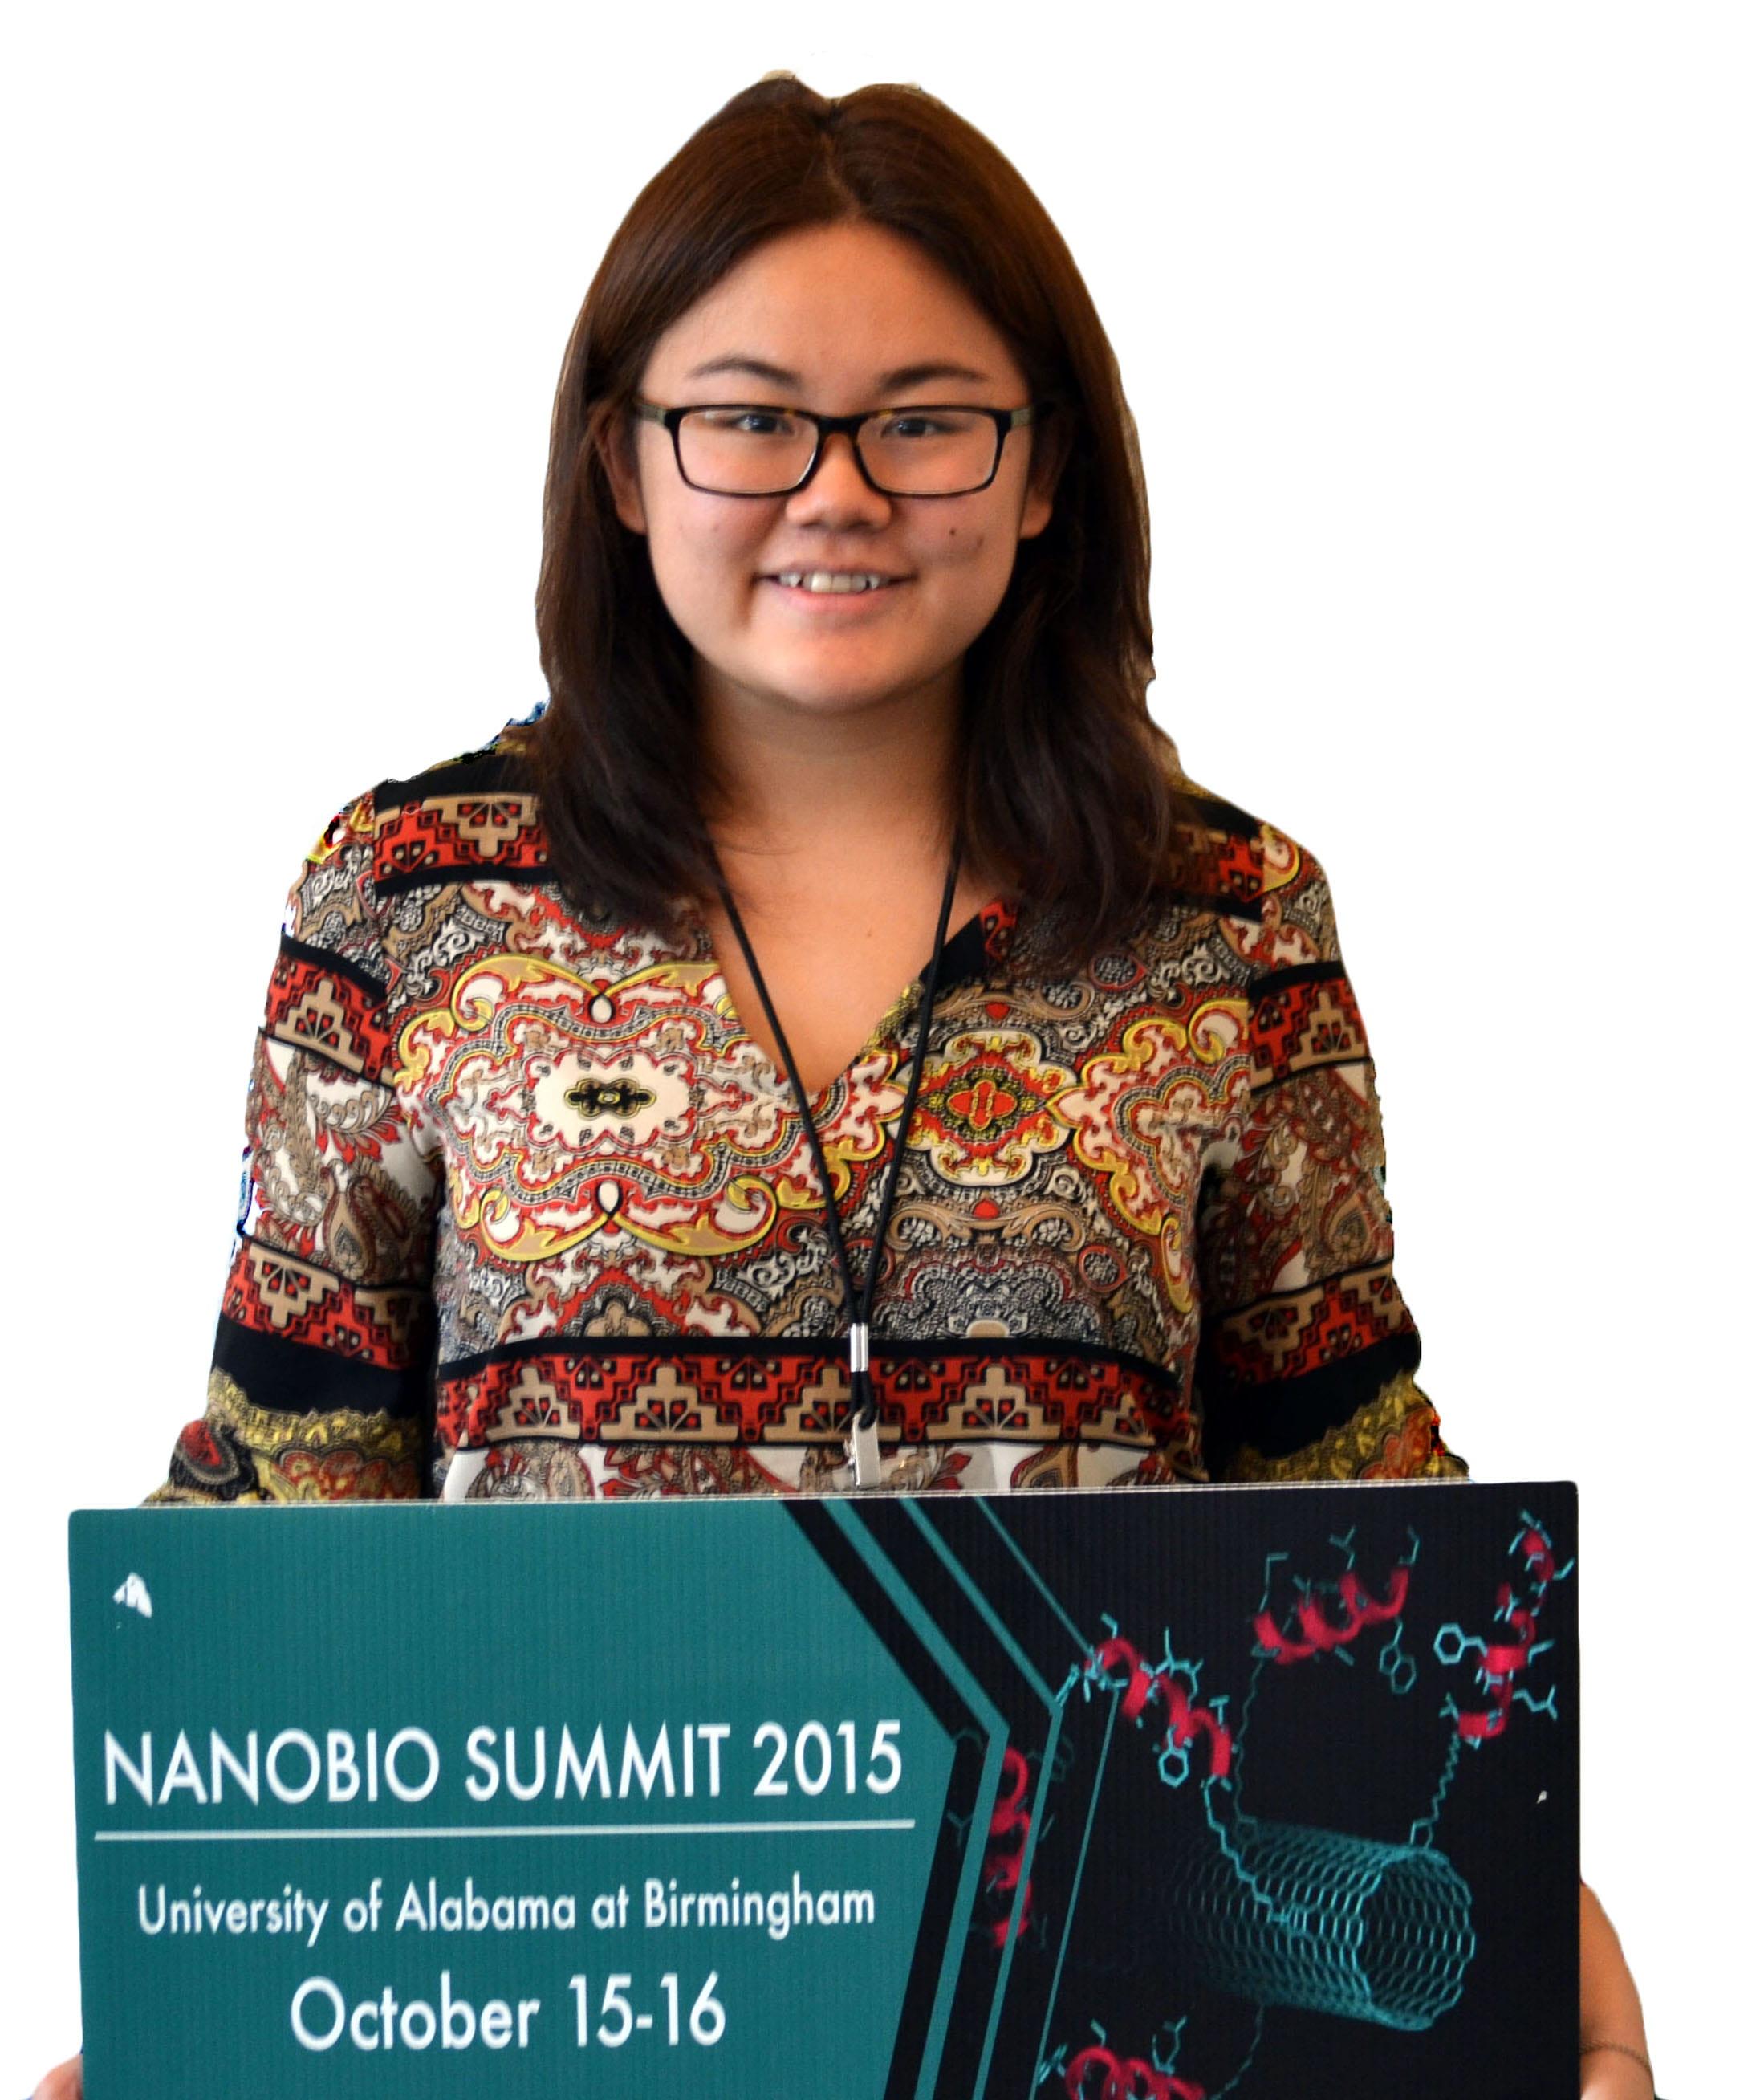 2015 NanoBio Summit 1st Place Winner